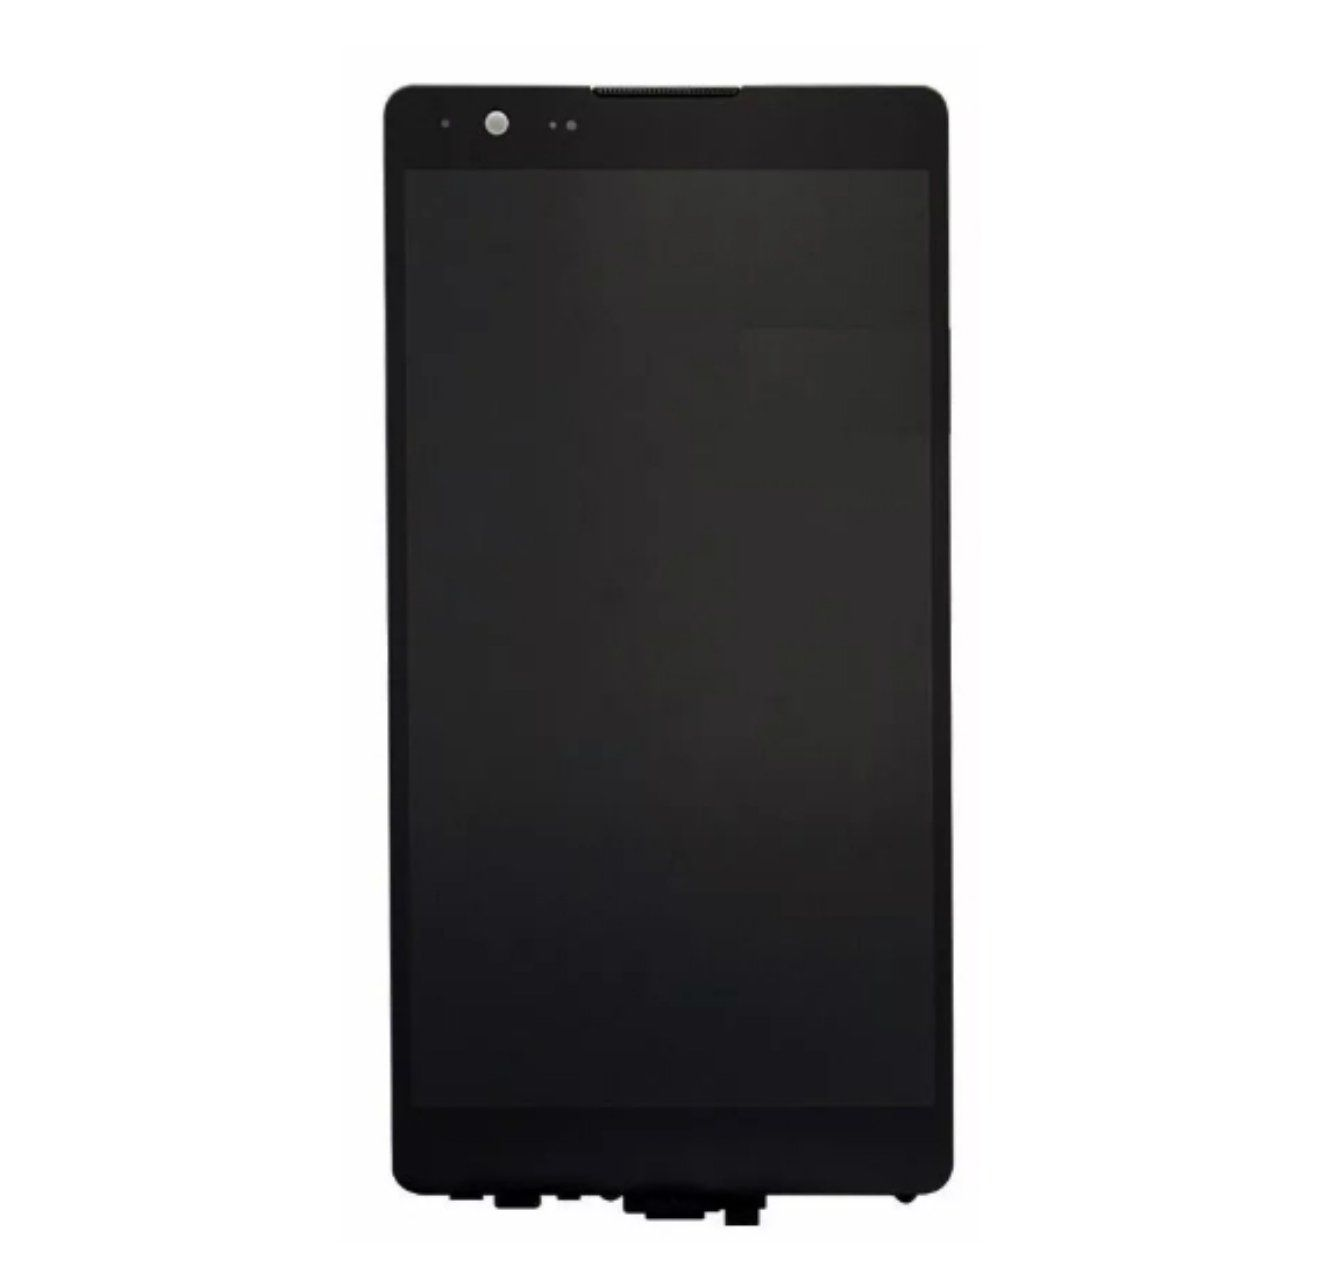 Display Frontal LG X Power K220 K 220 Preto com Aro